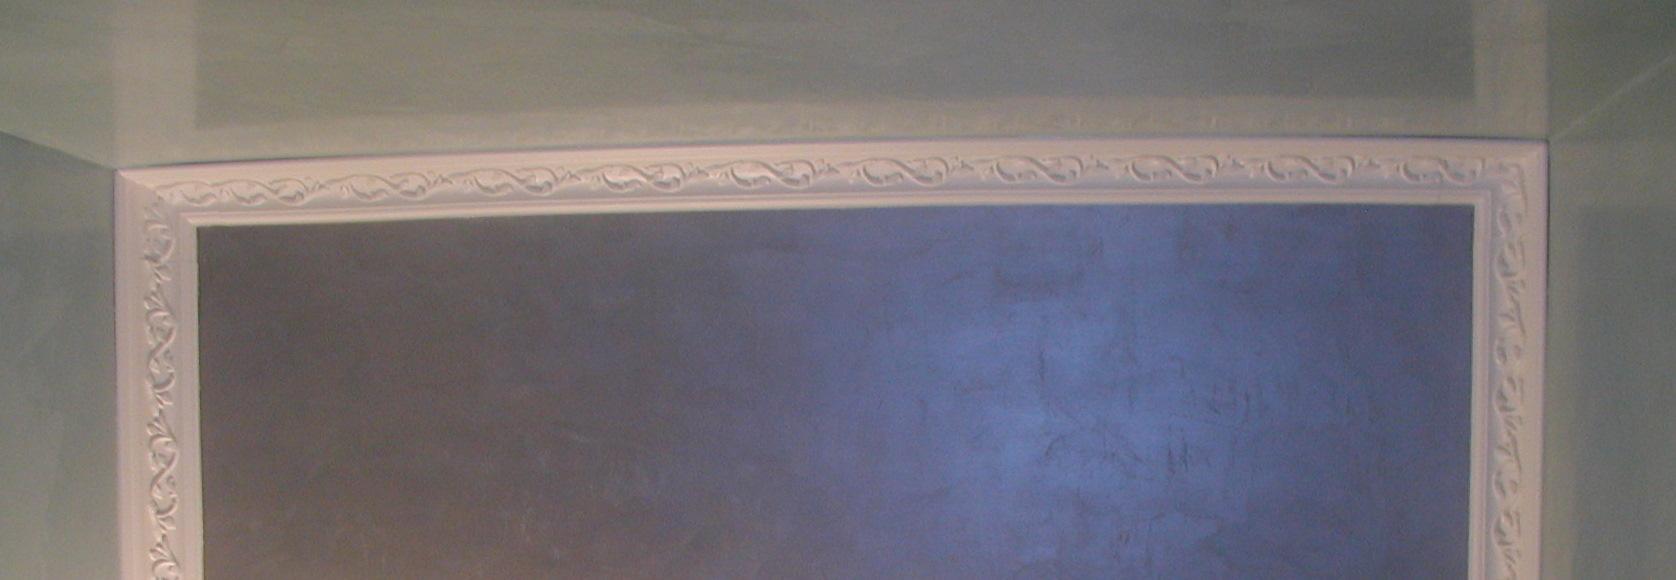 venetian plaster front porch cozy. Black Bedroom Furniture Sets. Home Design Ideas